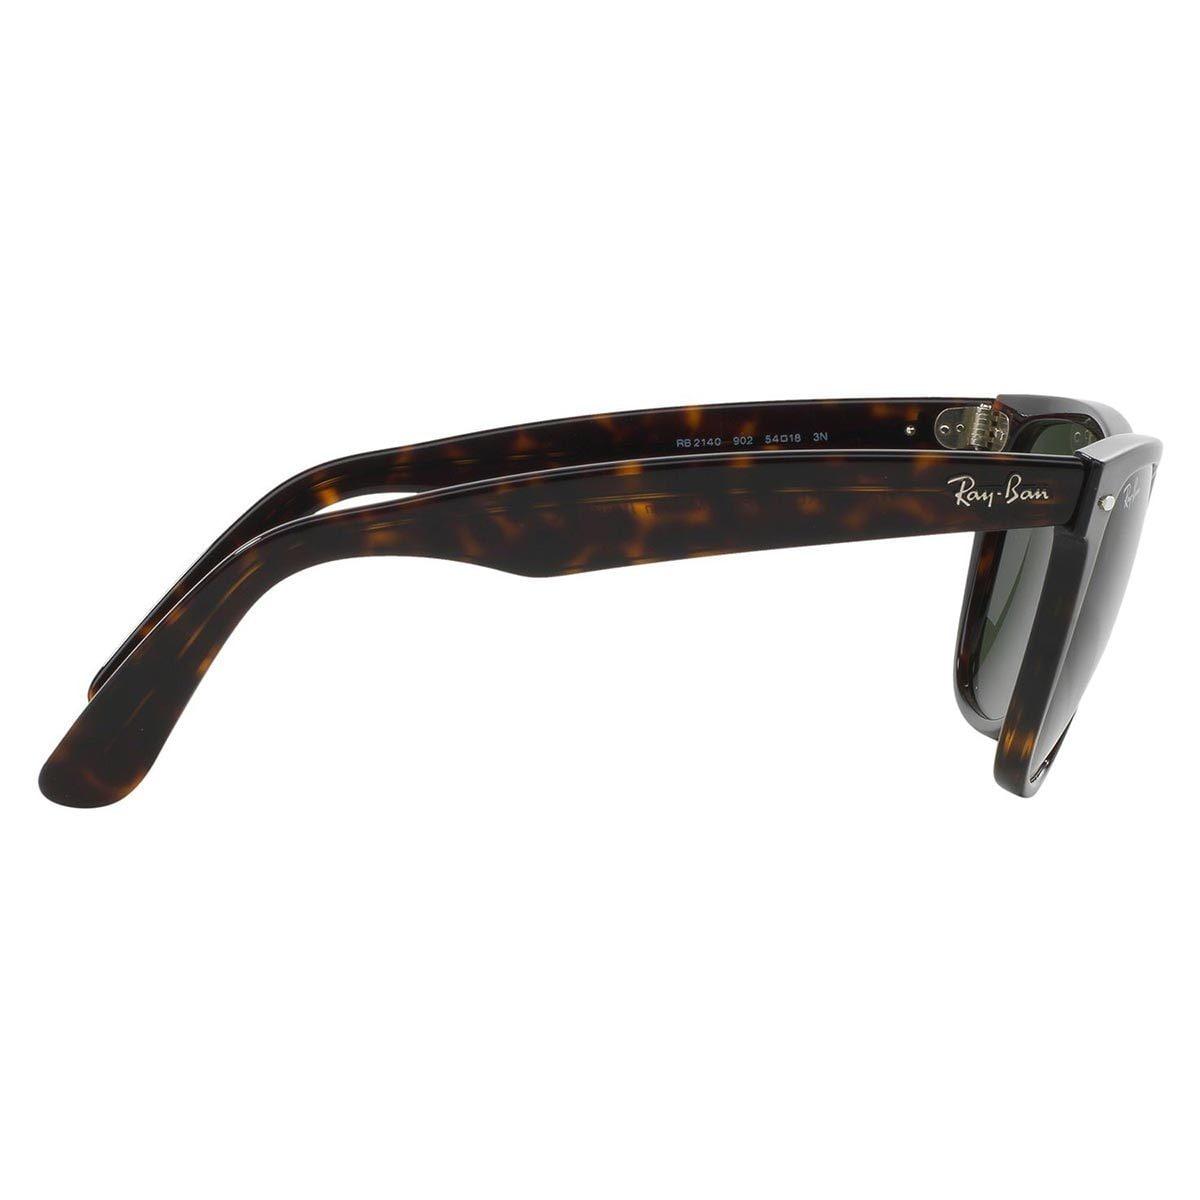 34ed989b6bf Shop Ray-Ban Men s Original Wayfarer Tortoise Sunglasses - Free Shipping  Today - Overstock - 8171958